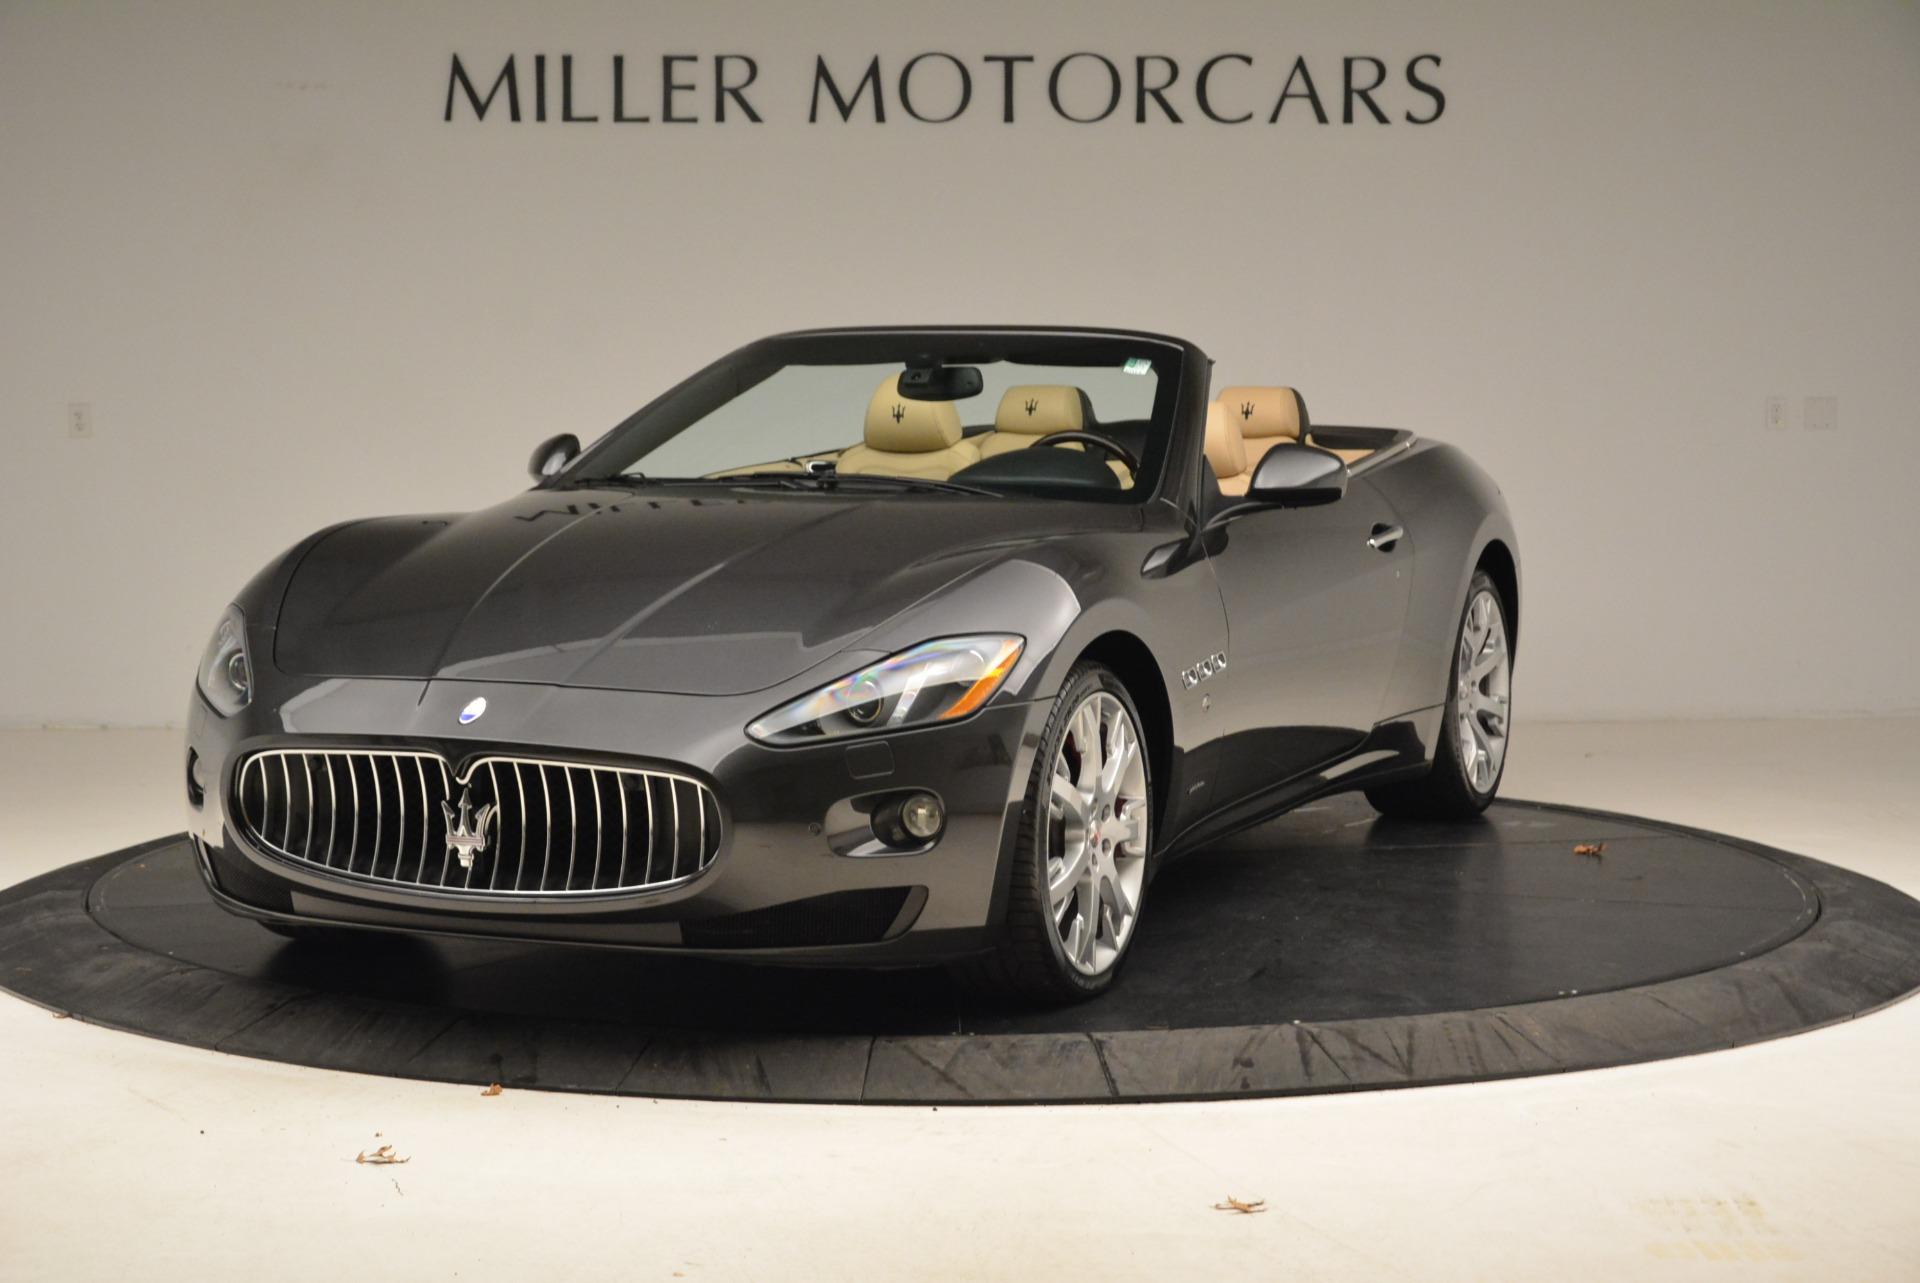 Used 2013 Maserati GranTurismo Convertible for sale Sold at Aston Martin of Greenwich in Greenwich CT 06830 1